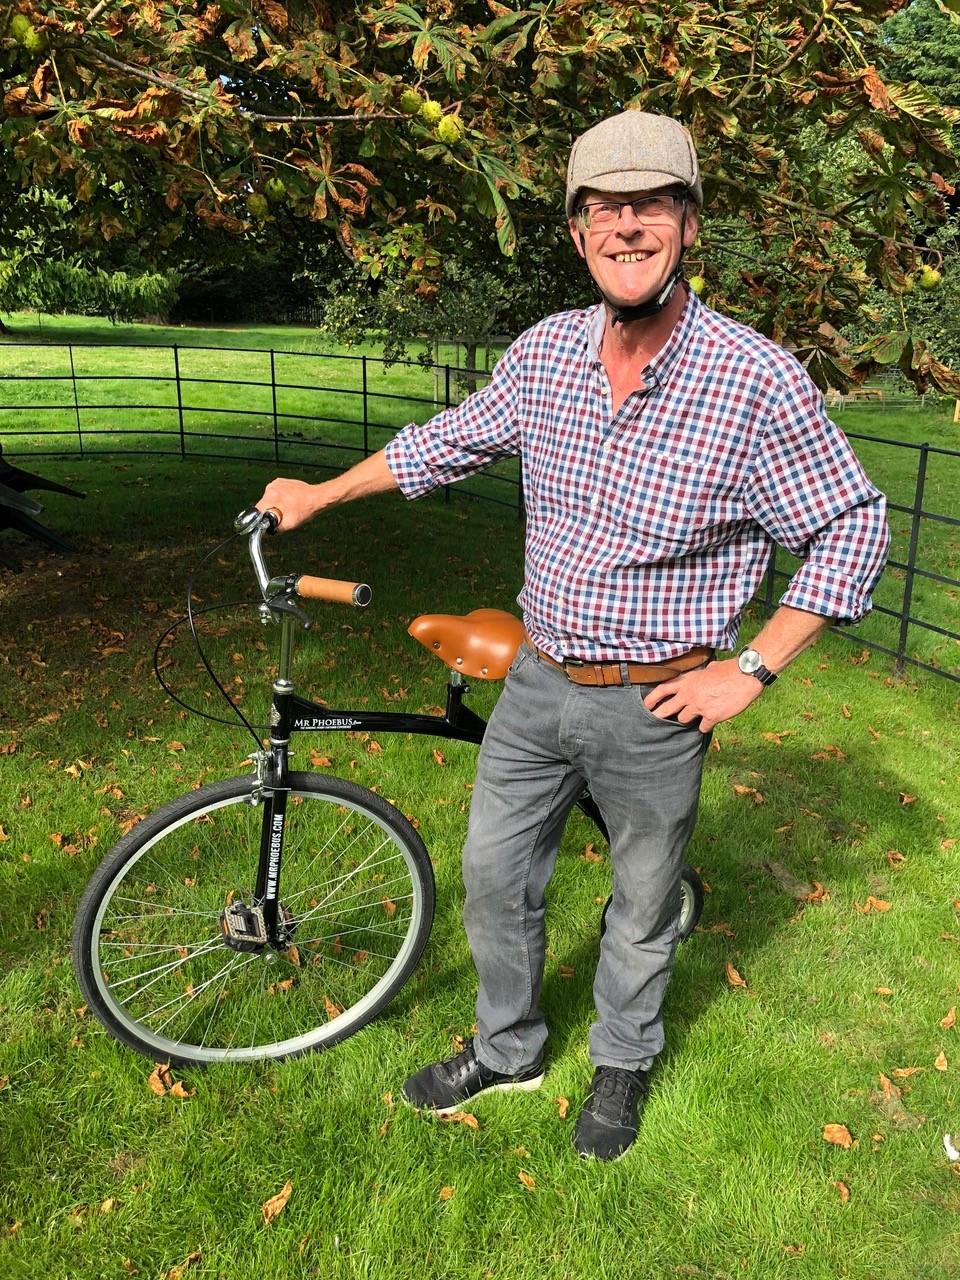 Keith's crazy bike